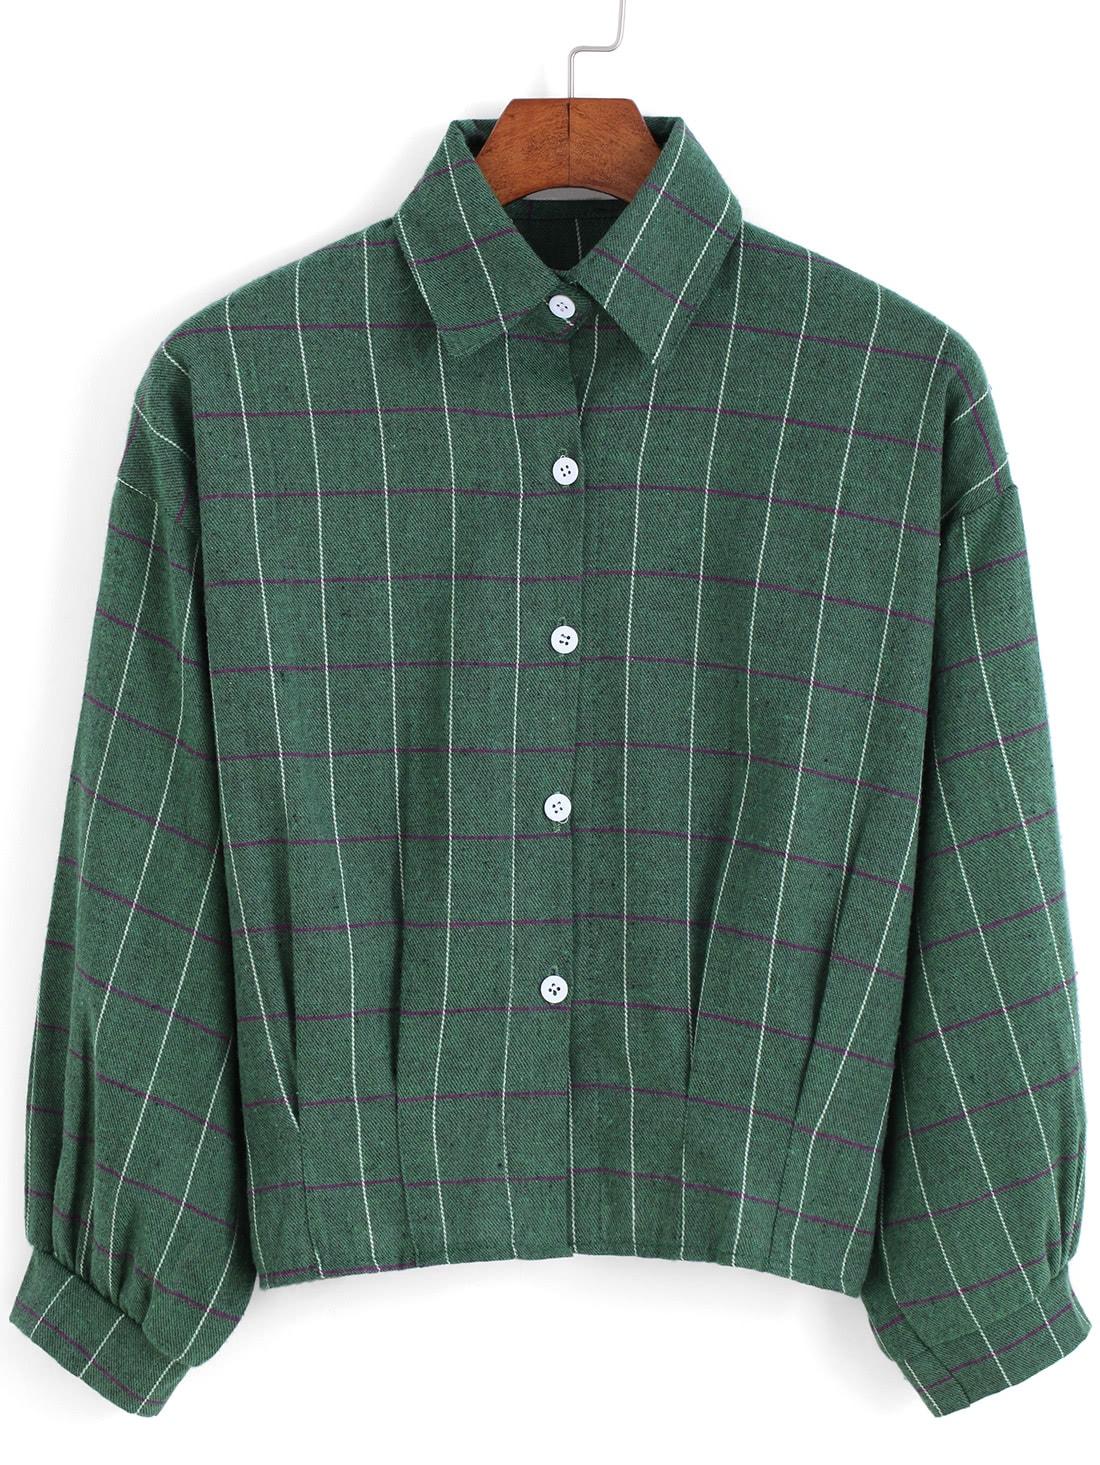 Green Lapel Preppy Appropriately Checks Plaid Buttons Crop Blouse